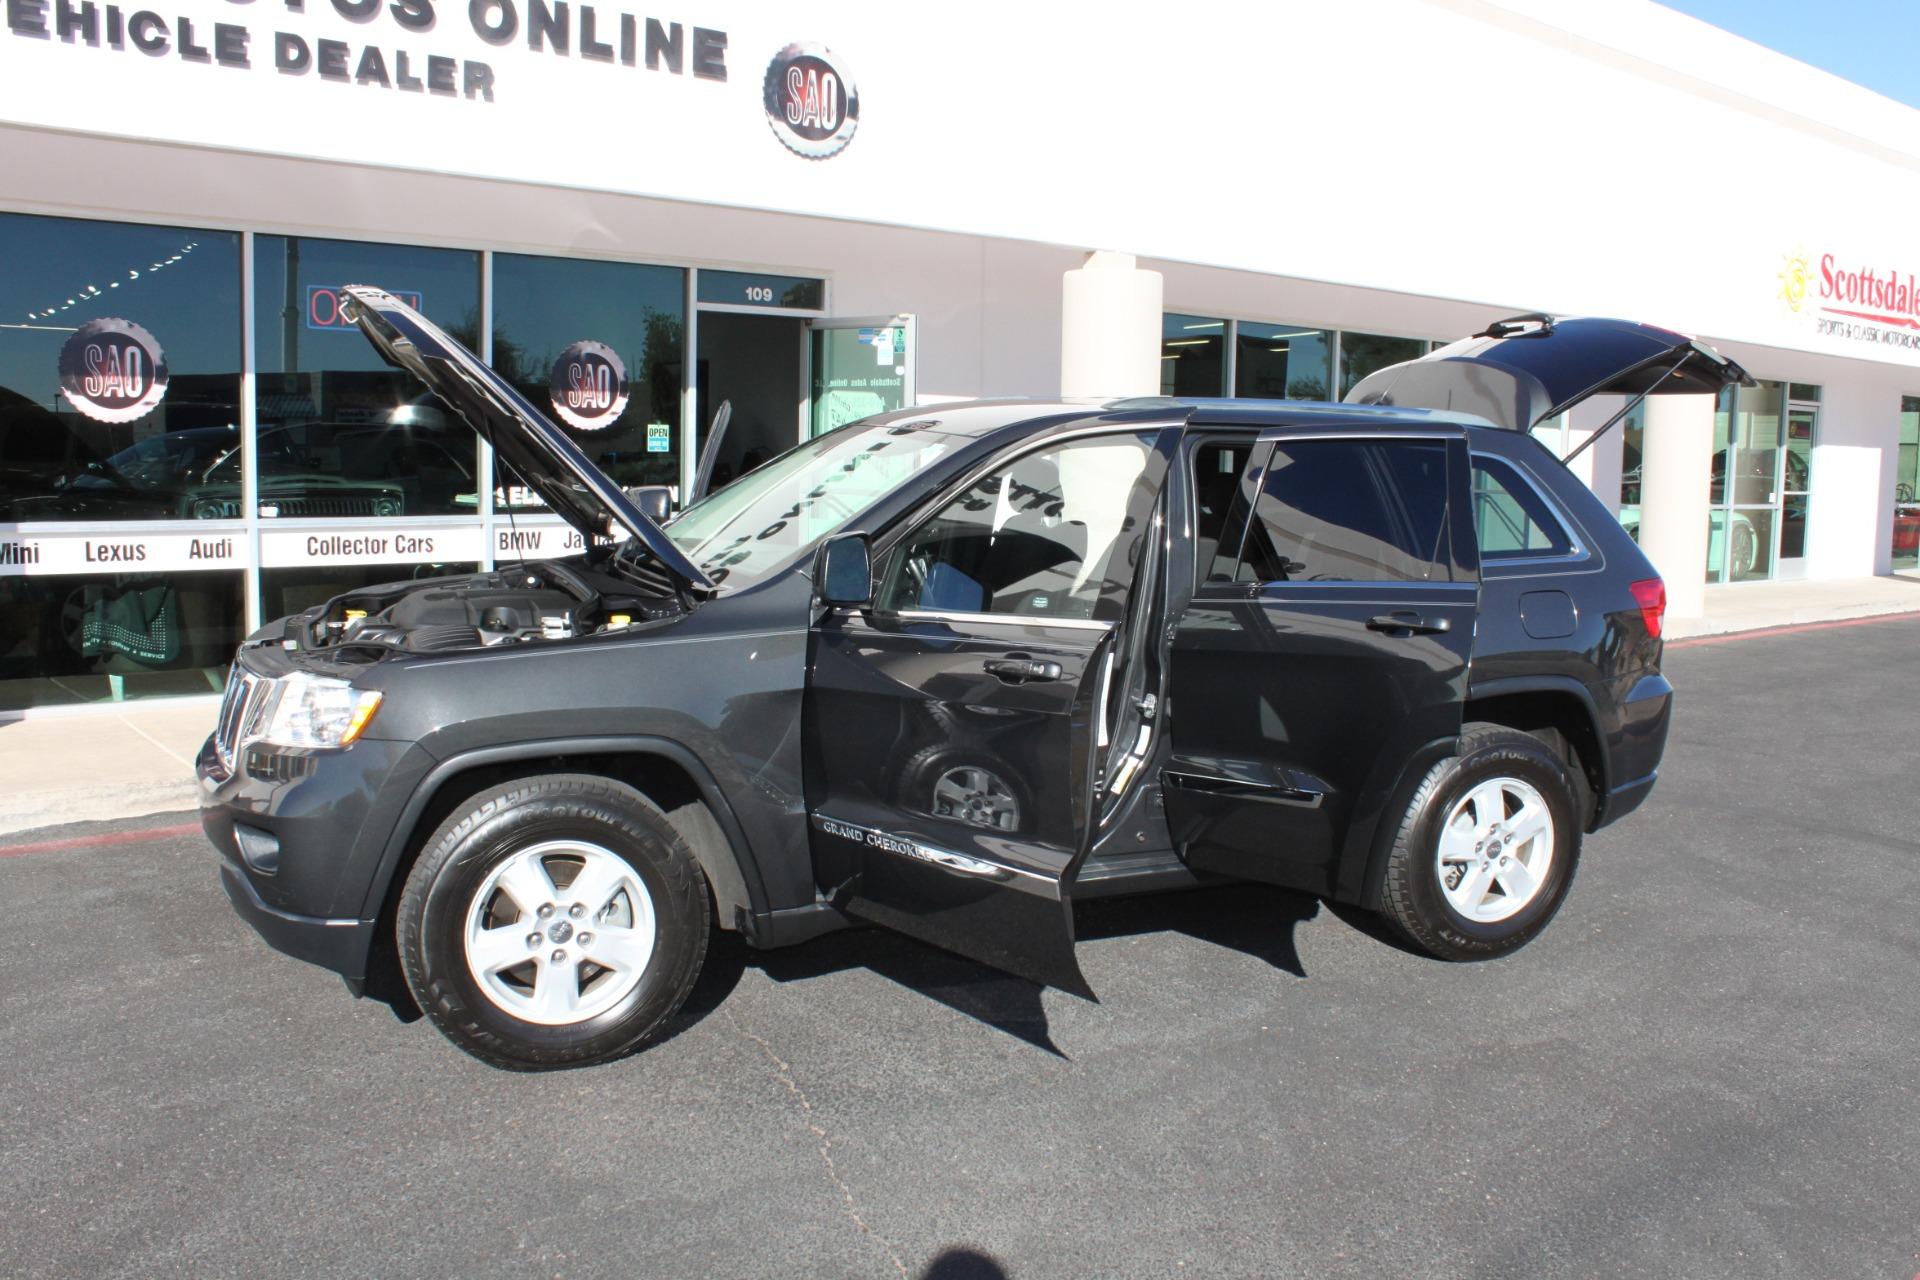 Used-2011-Jeep-Grand-Cherokee-Laredo-Alfa-Romeo